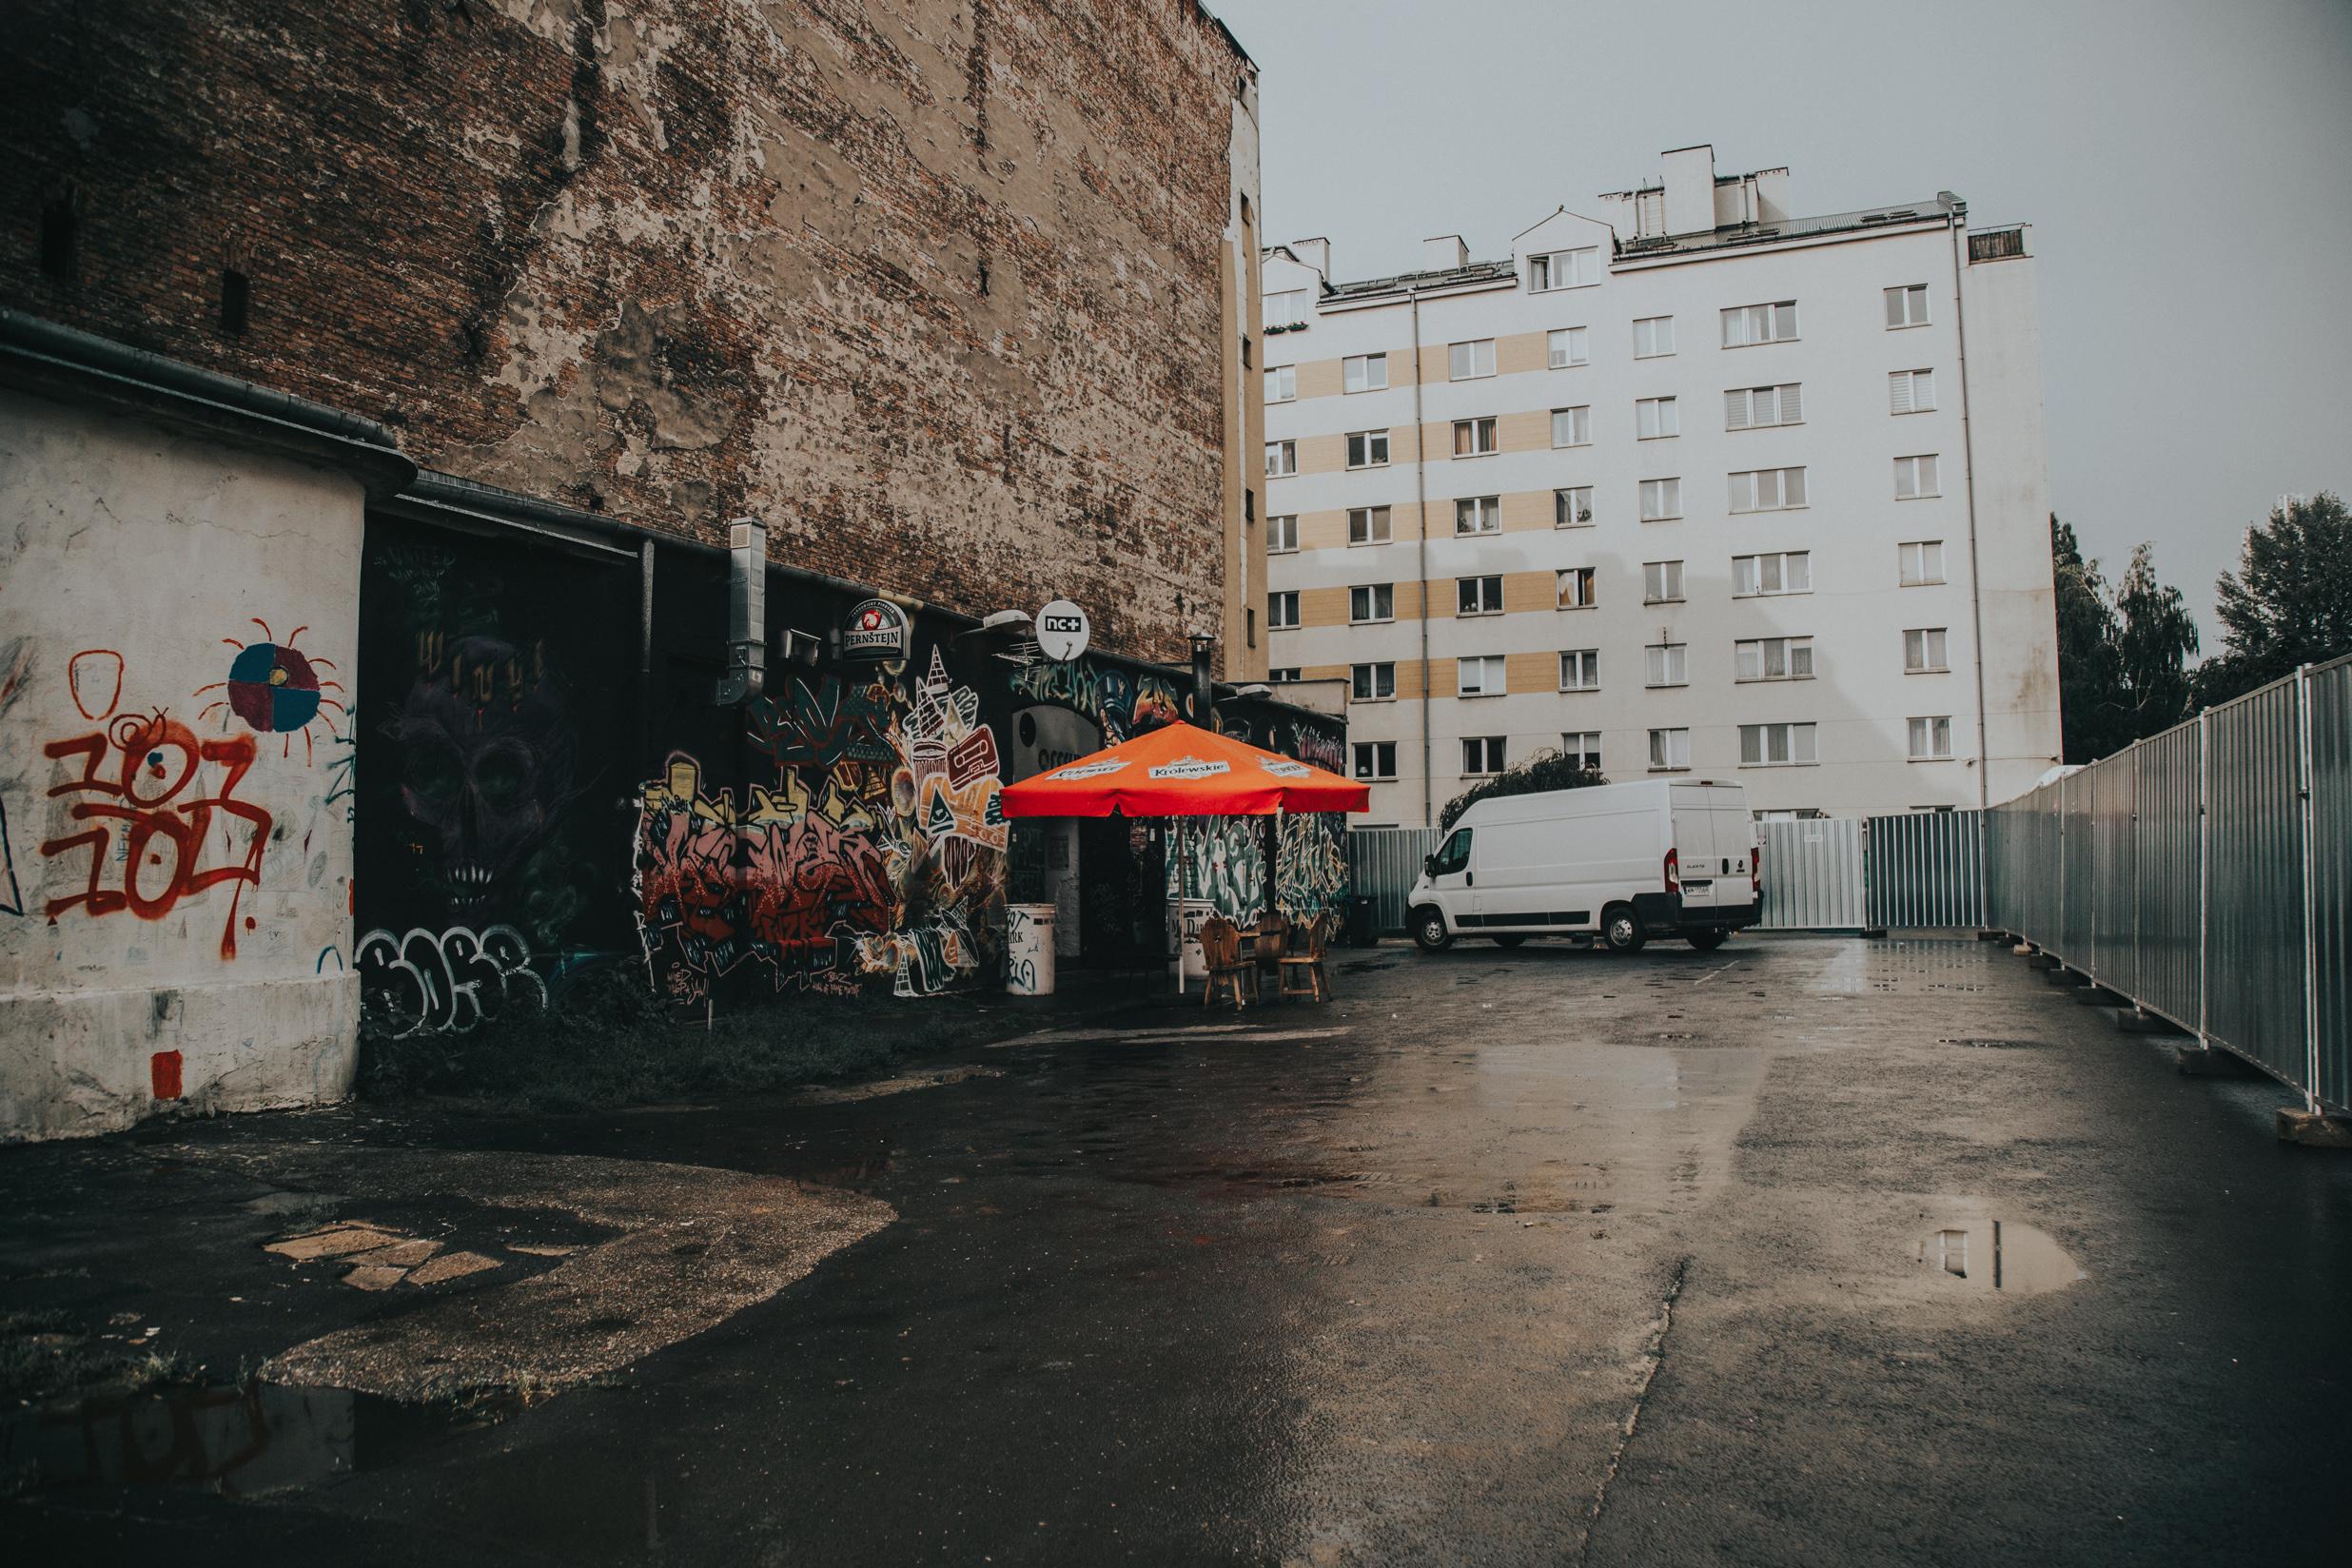 img_7884-edit